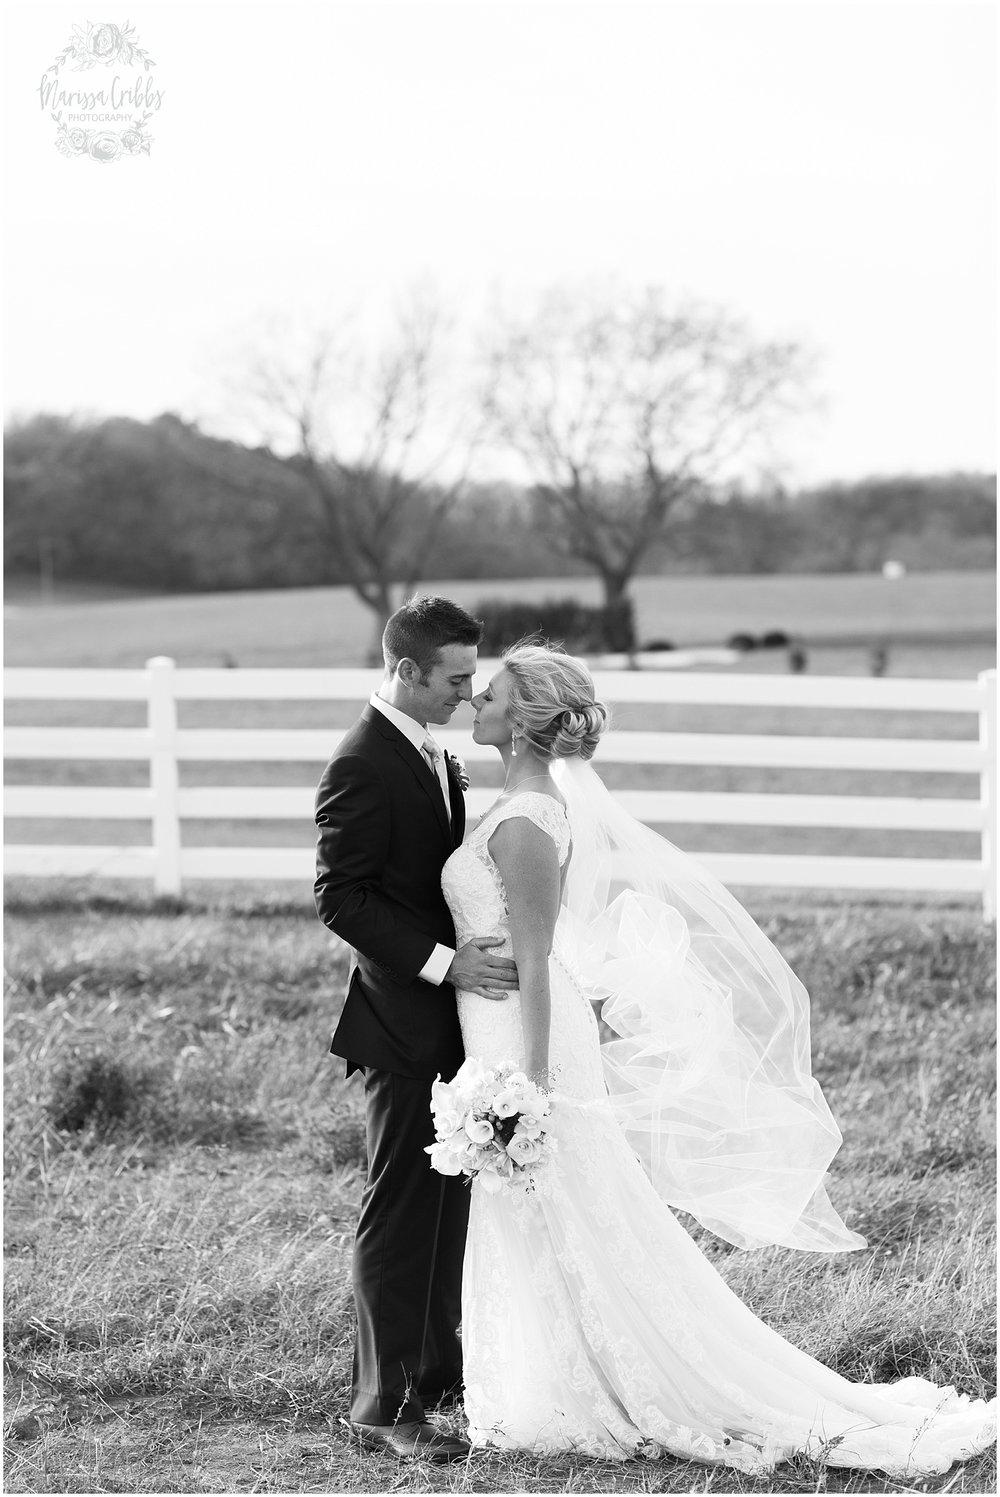 Alex & Amie | Eighteen Ninety Event Space | Marissa Cribbs Photography | Kansas City Perfect Wedding Guide_1290.jpg